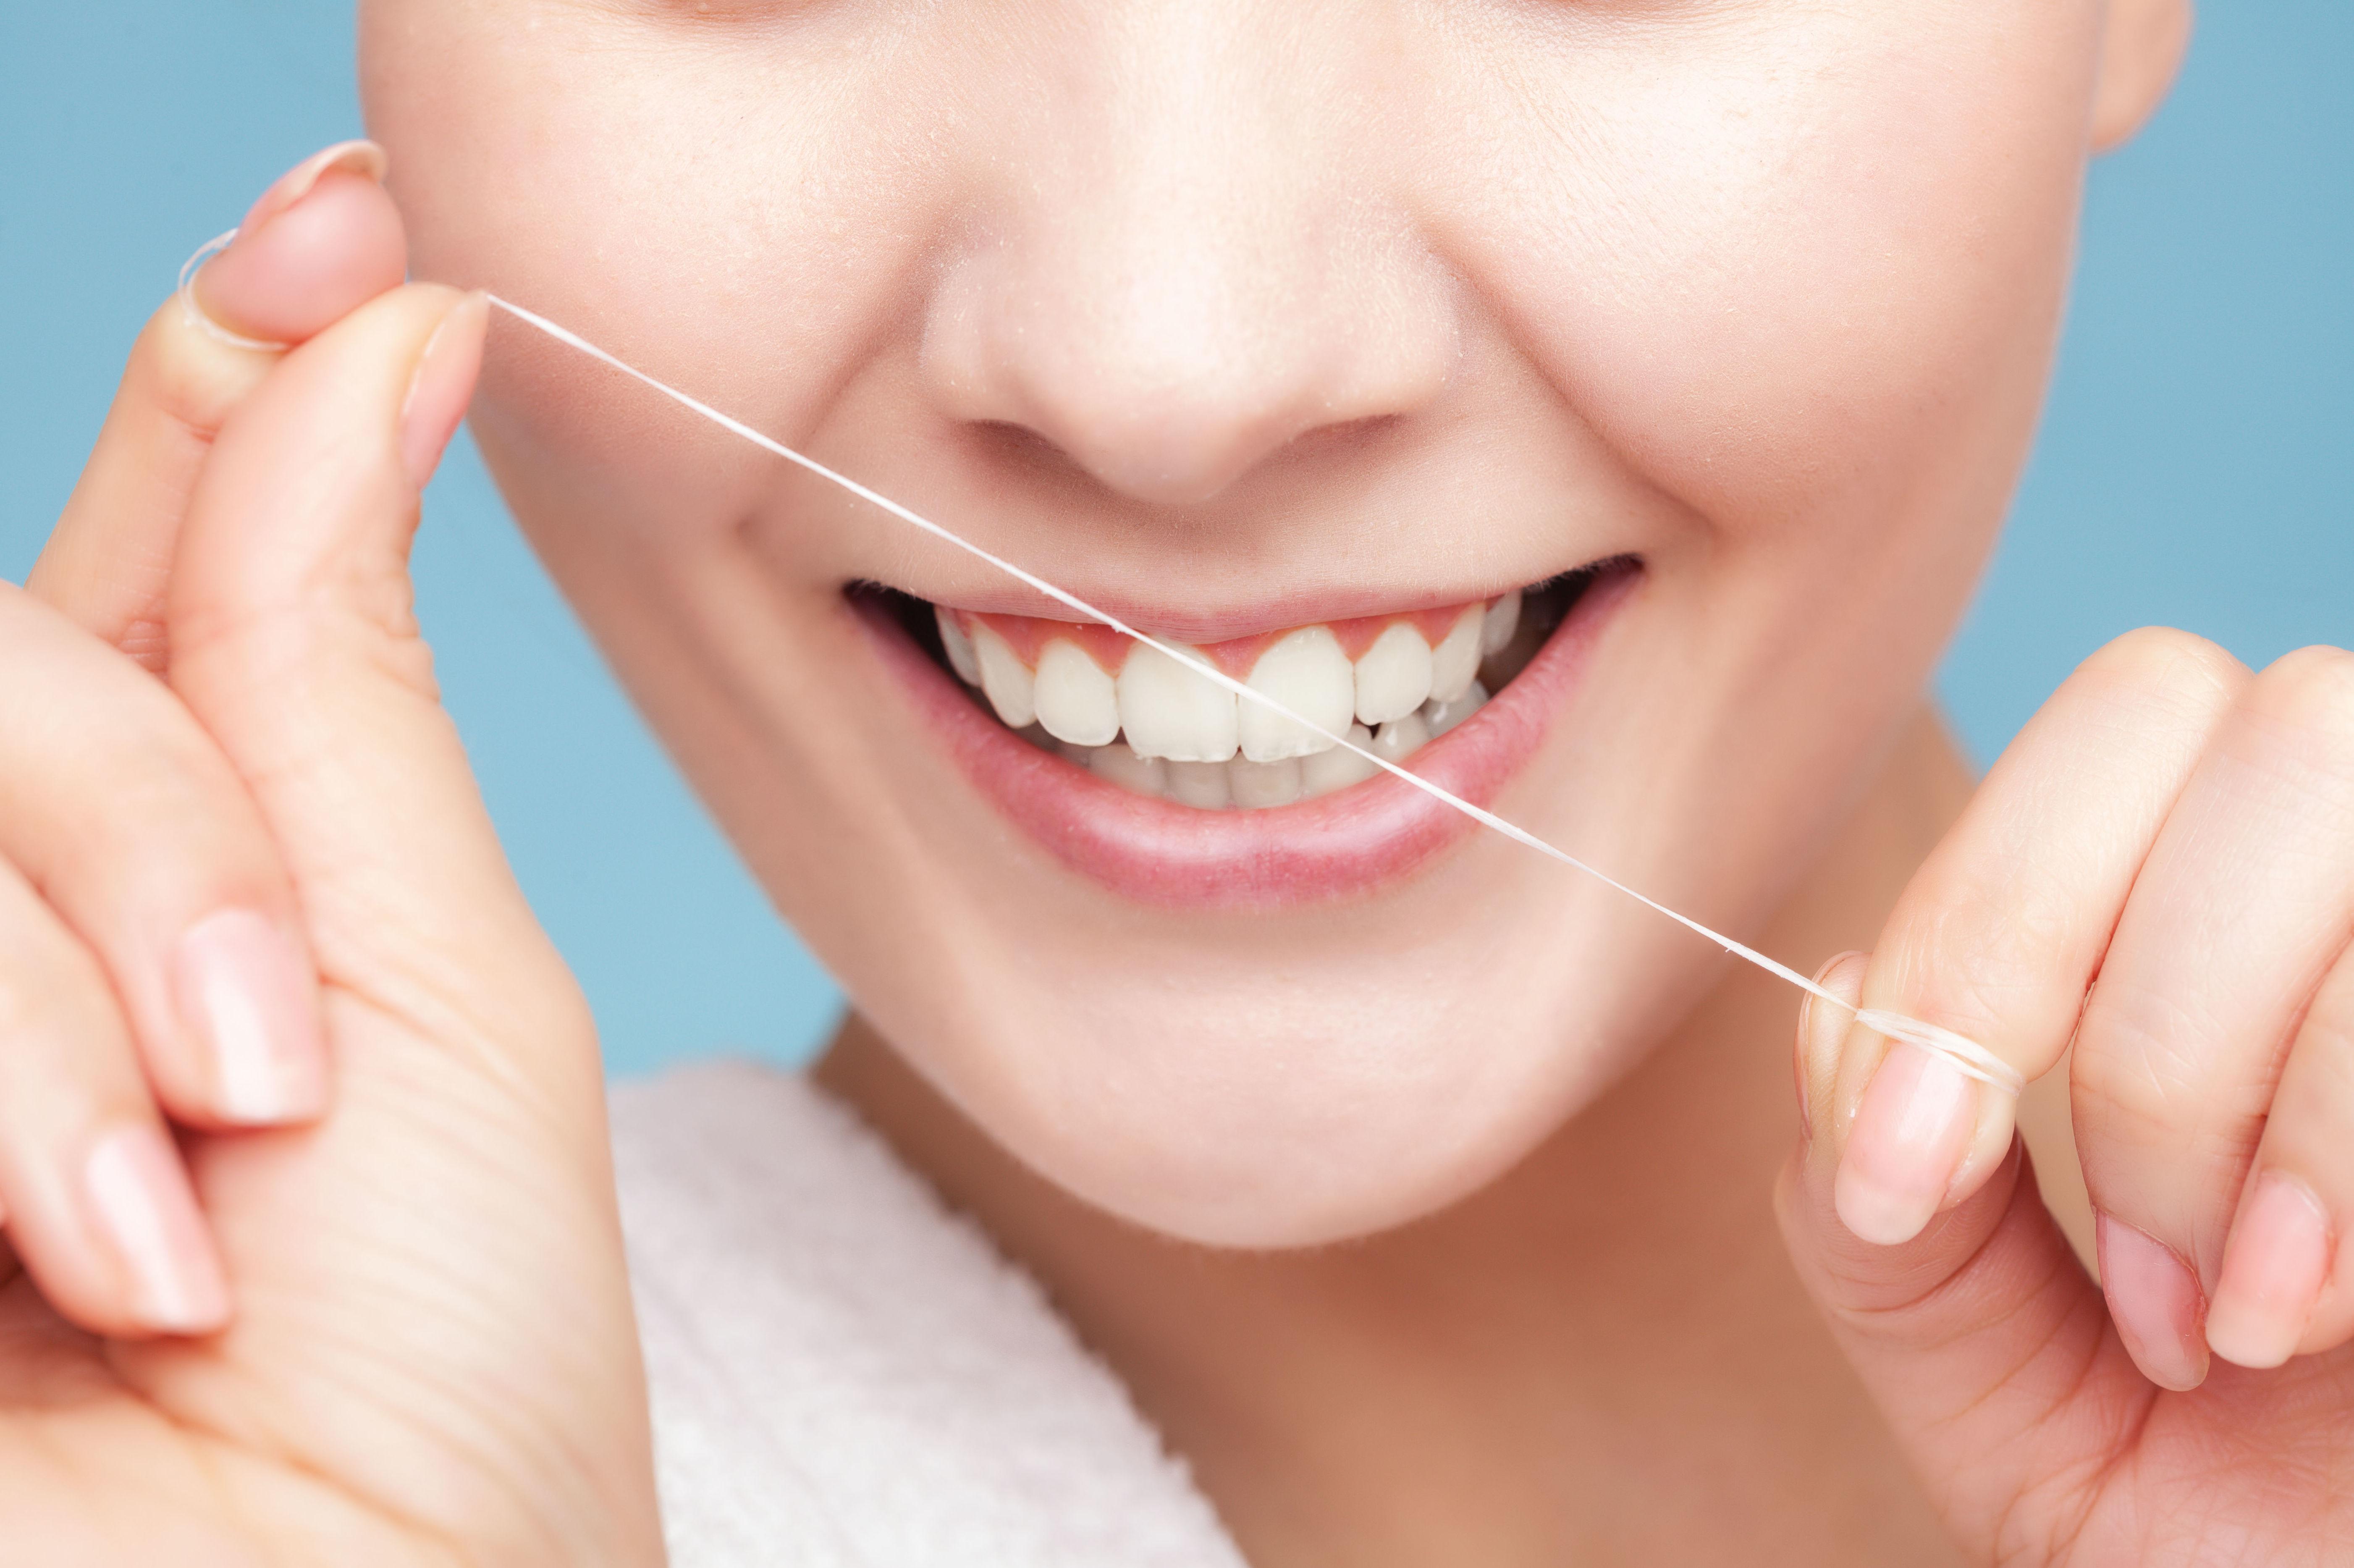 Periodoncia: Tratamientos de Dental Saja - Clínica Dental Dra. Sonia Fernández